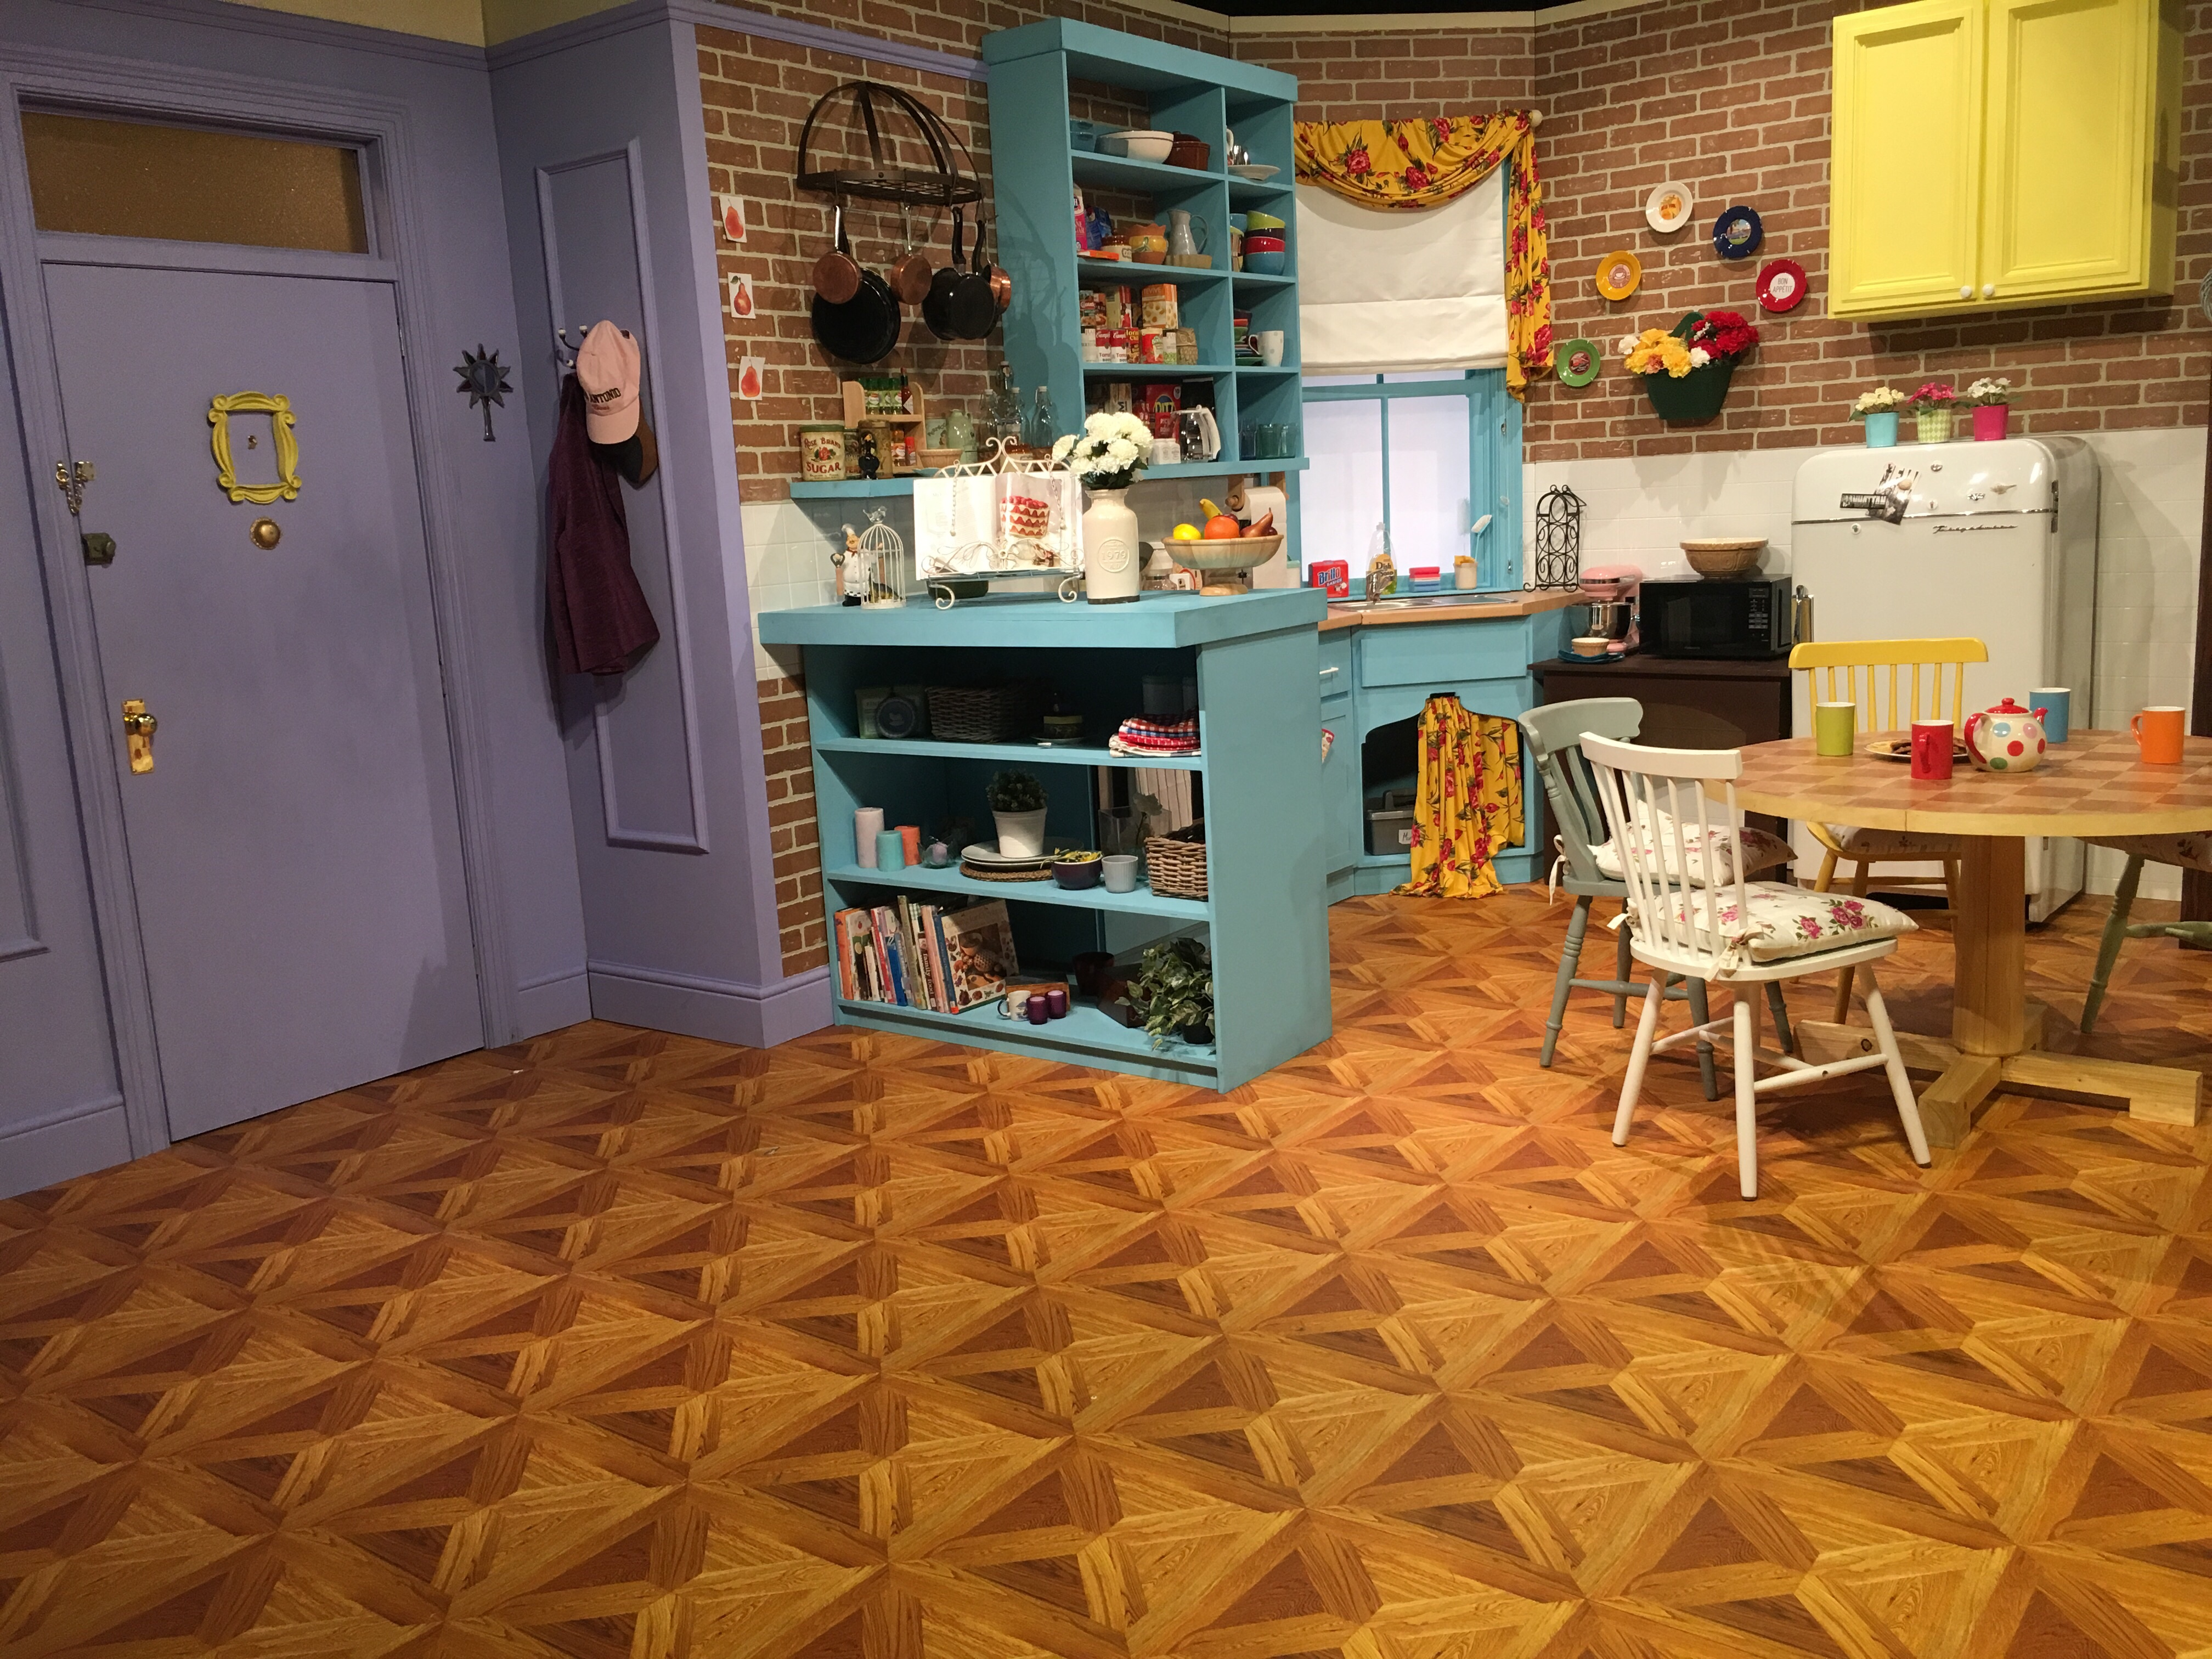 Inside Monica's apartment